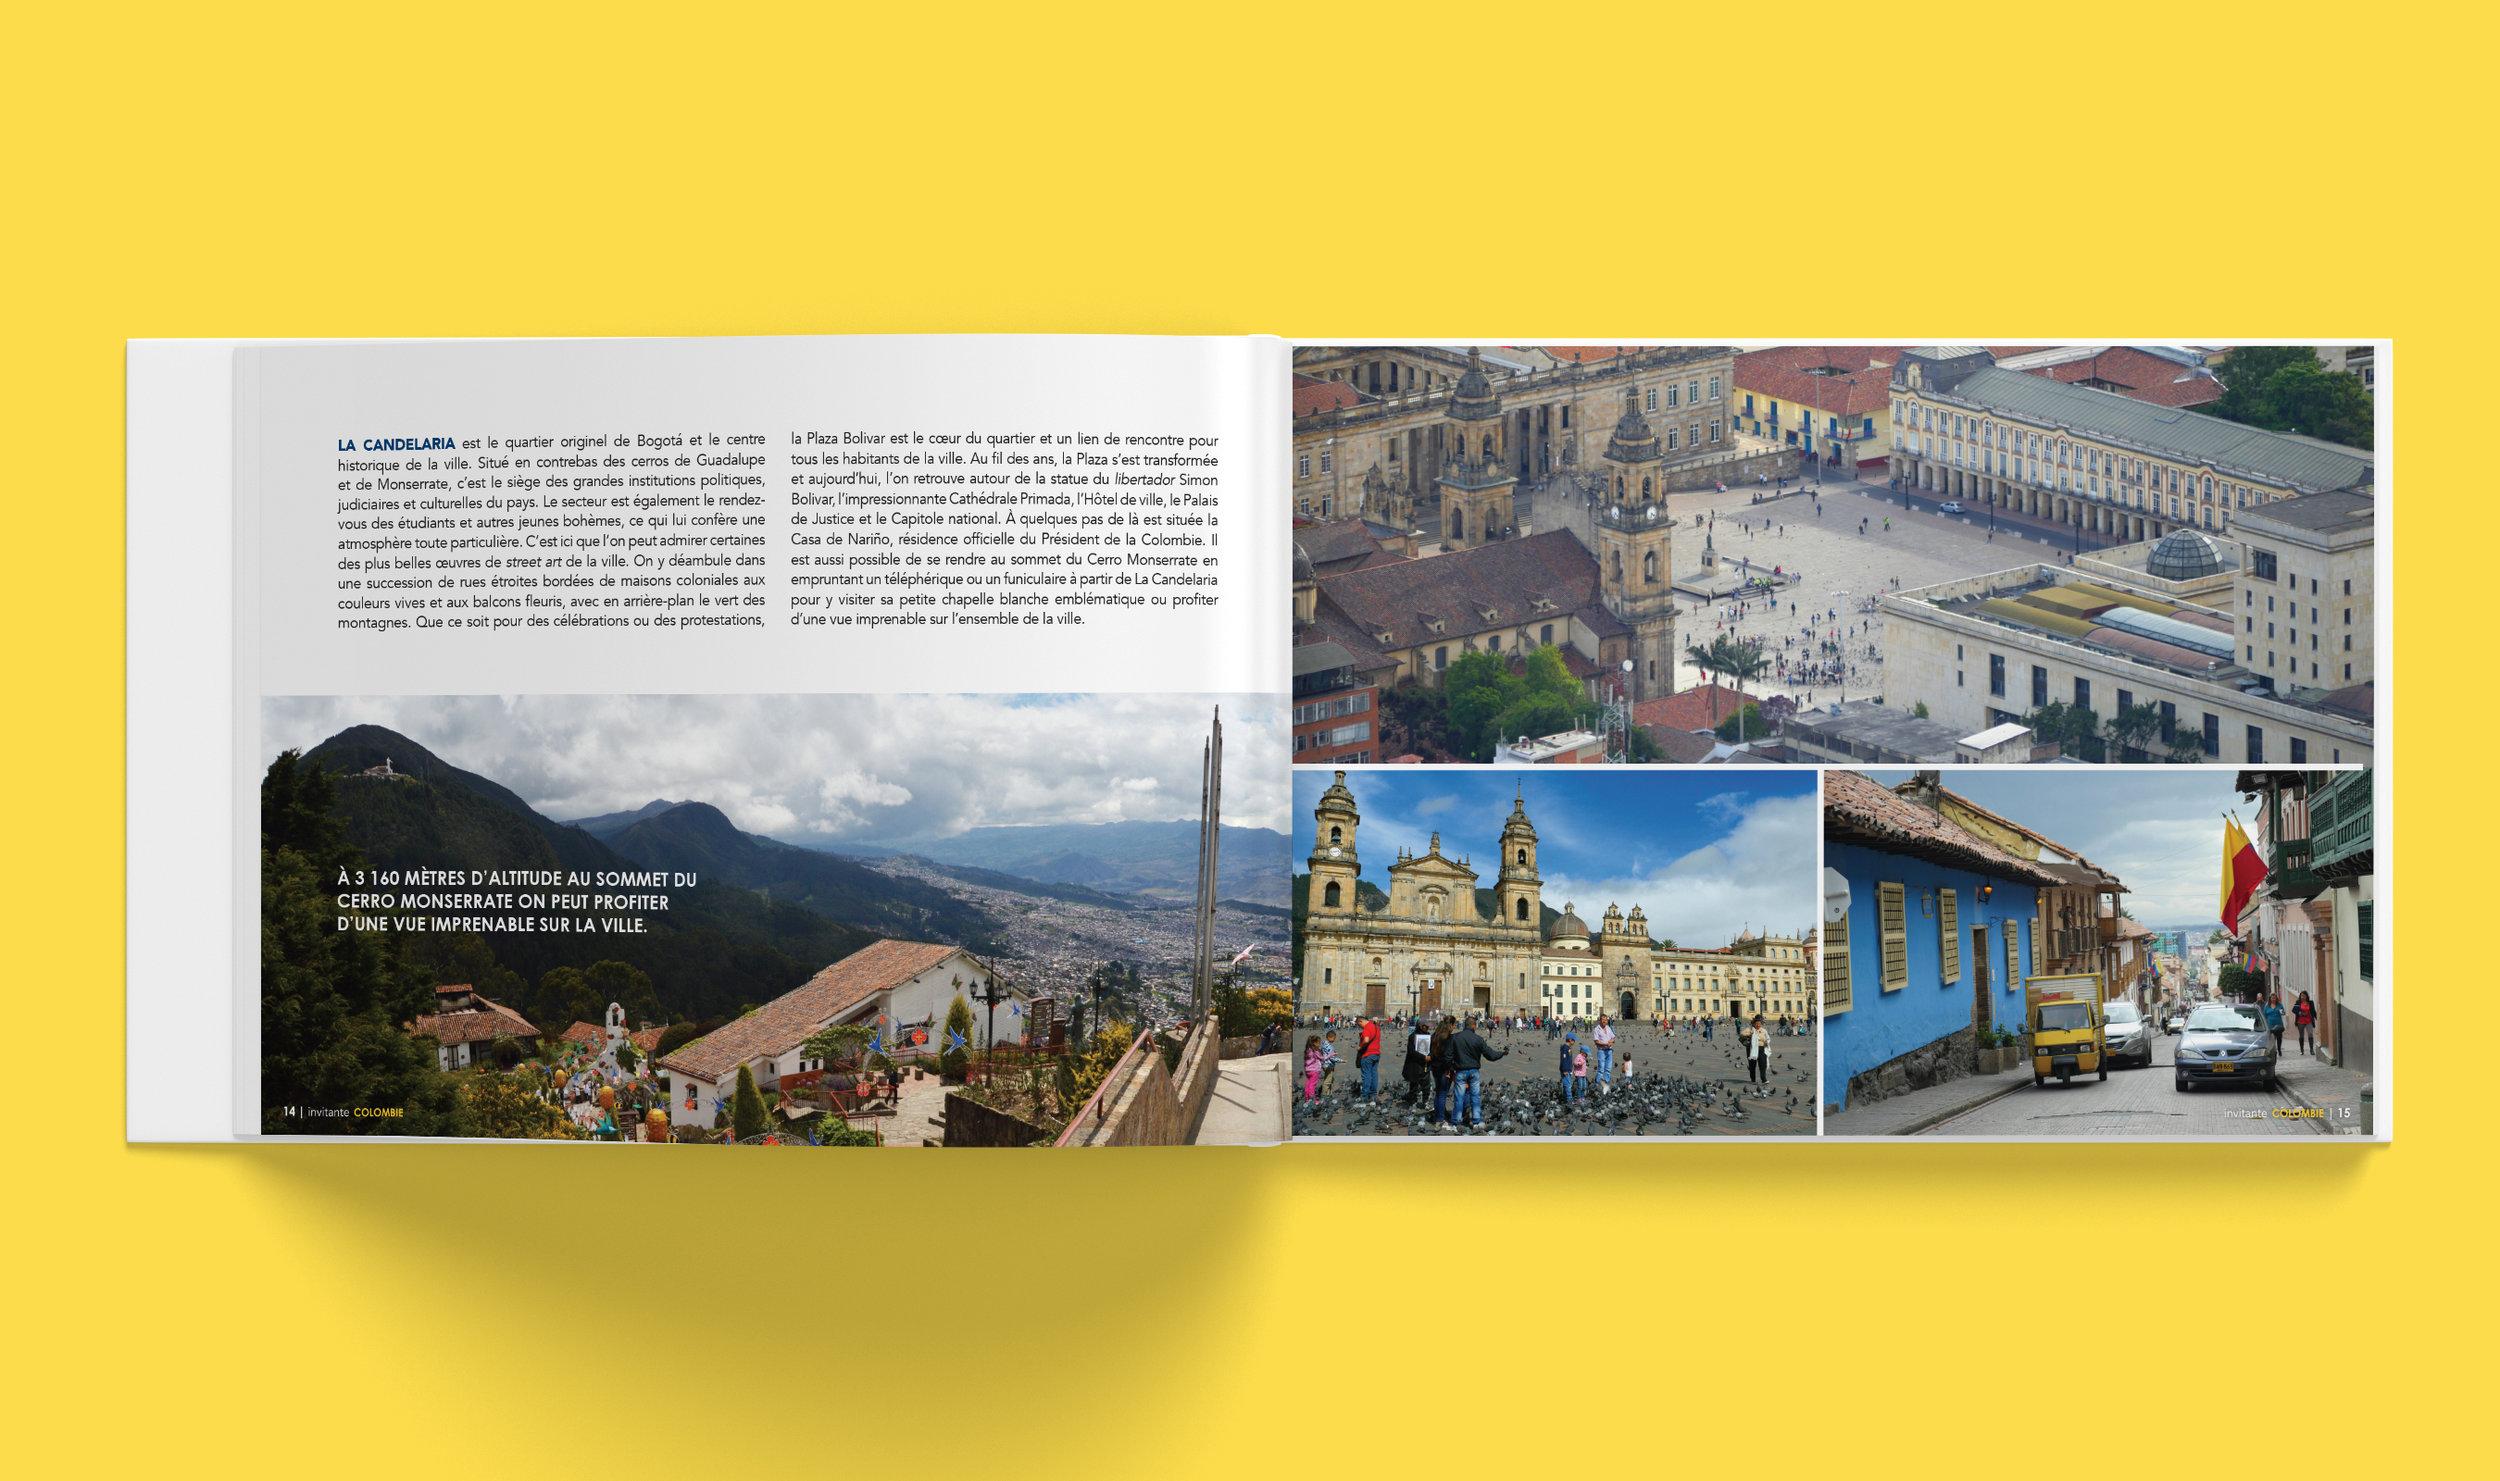 Colombia-Travel-Book-inside.jpg